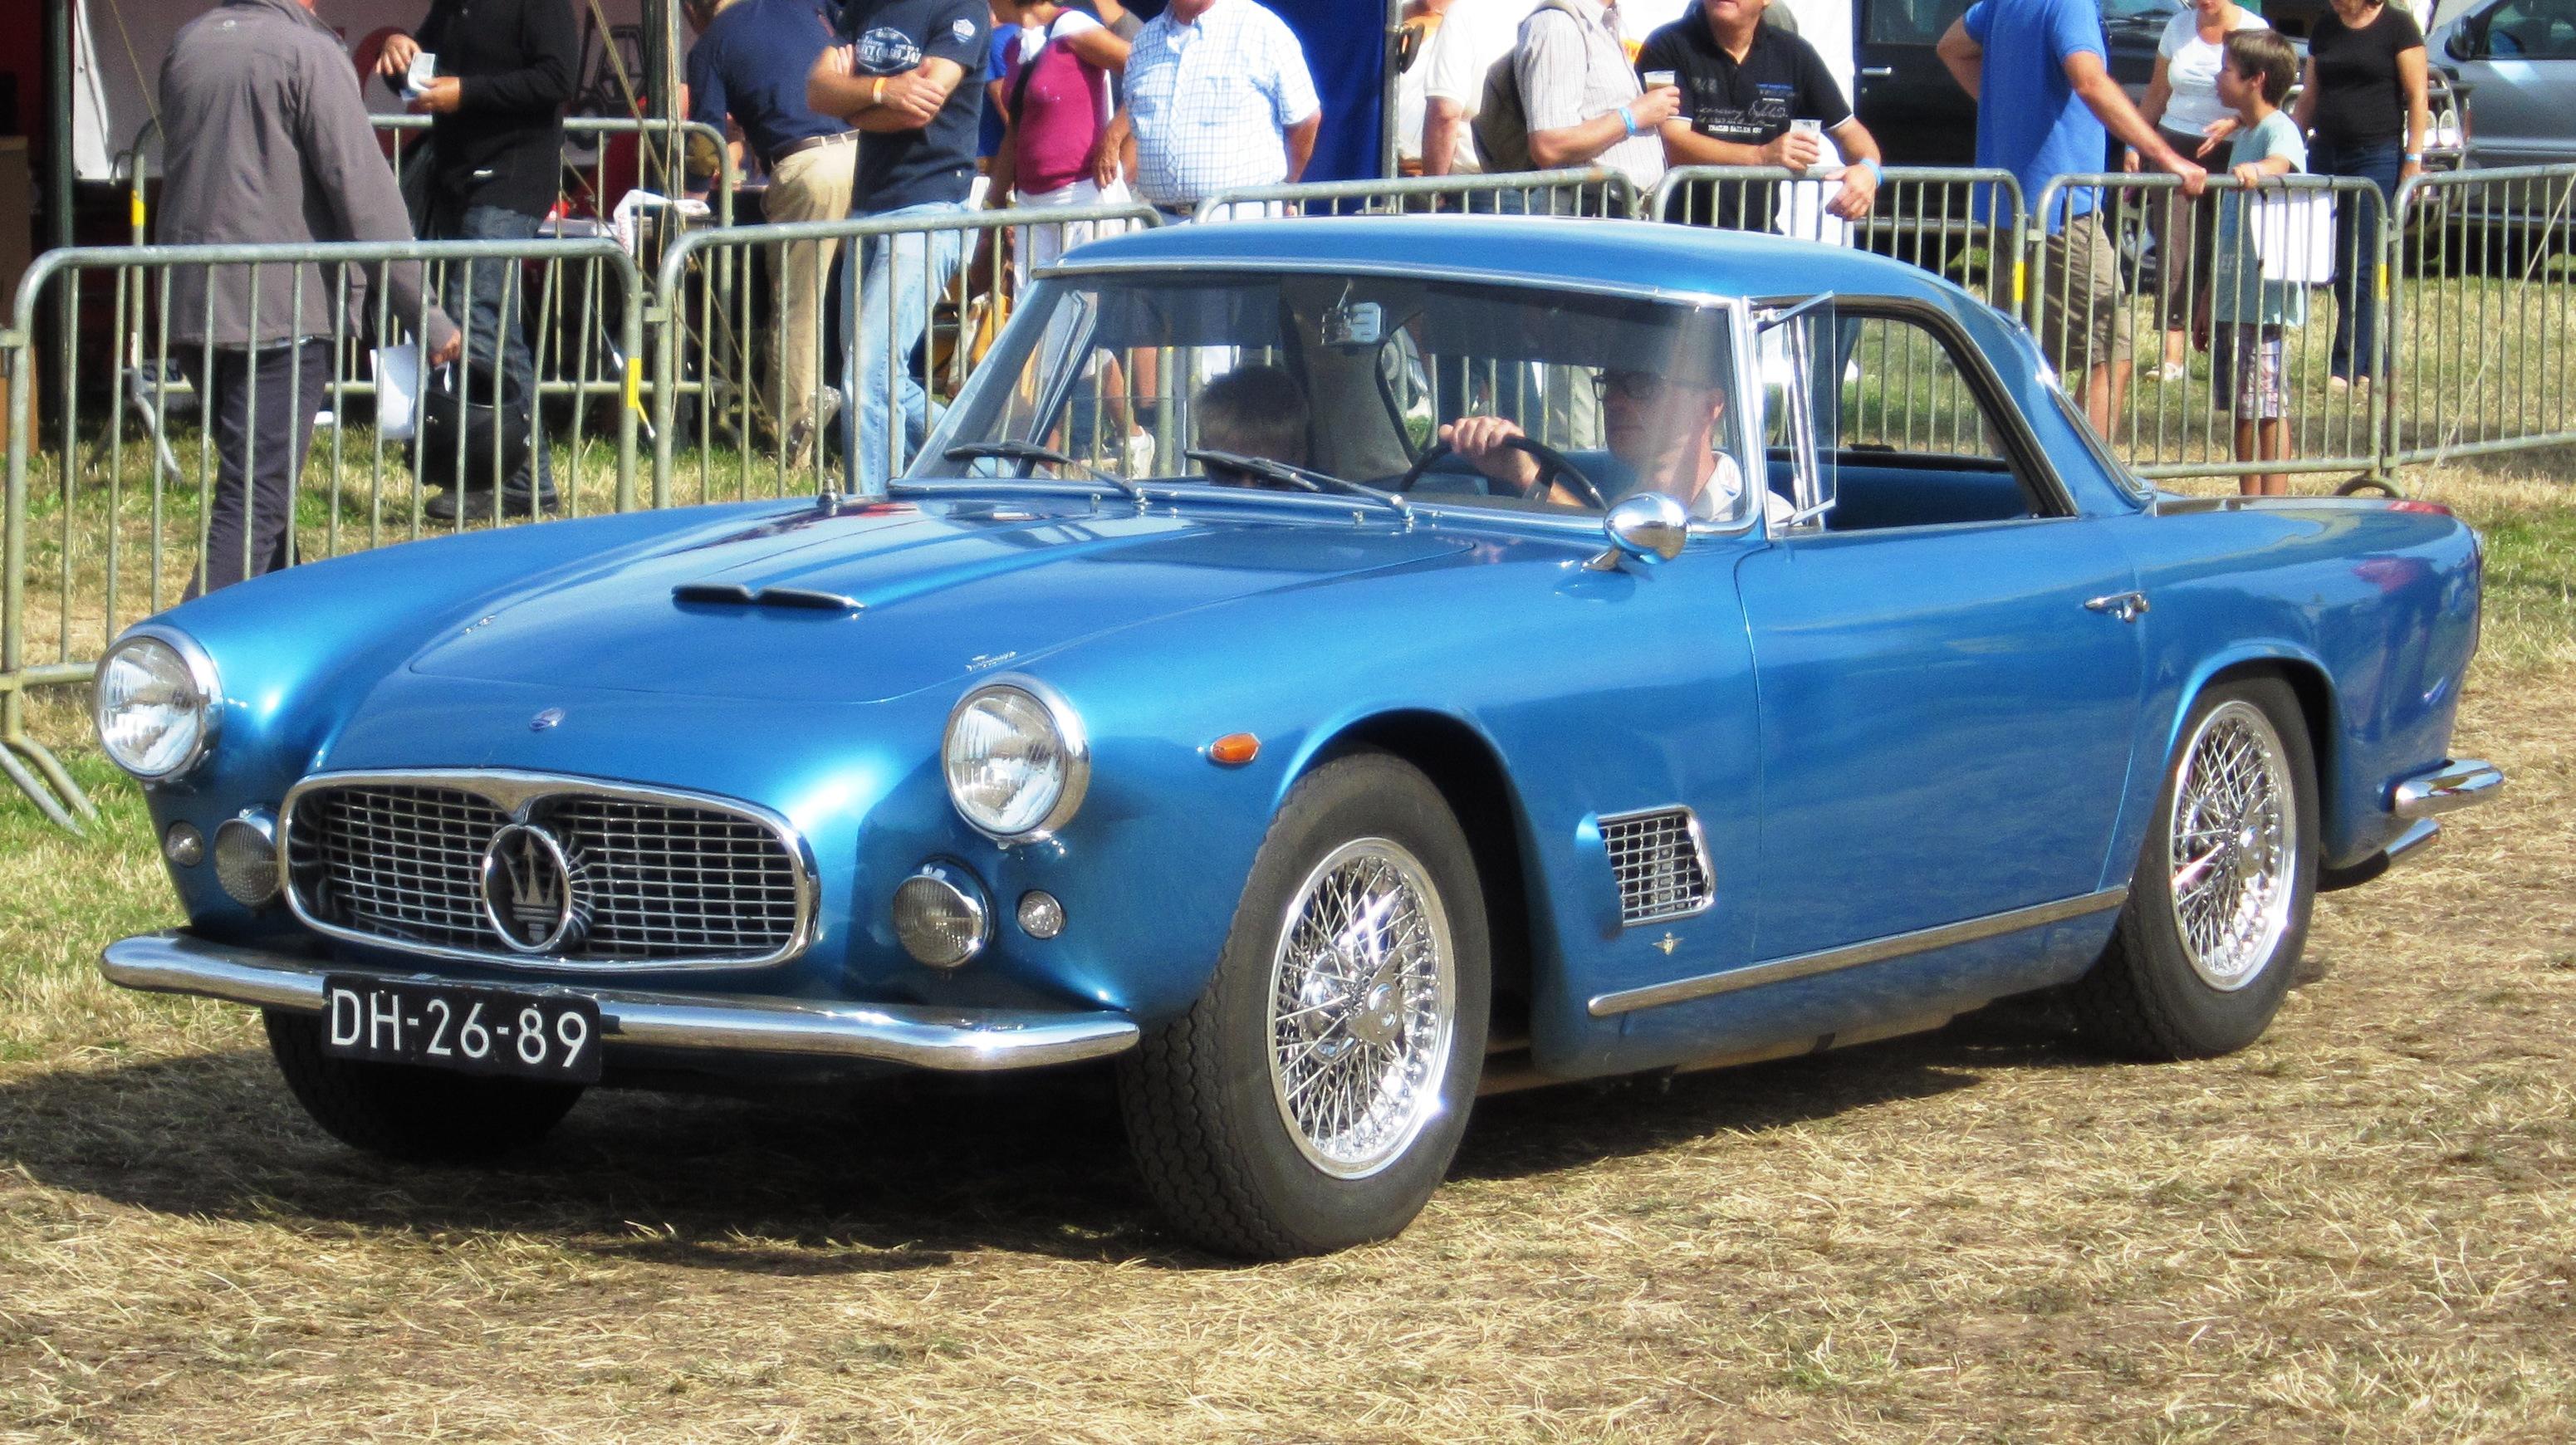 60 anni fa, 3500 GT Maserati_3500_GT_ca_1960_blue